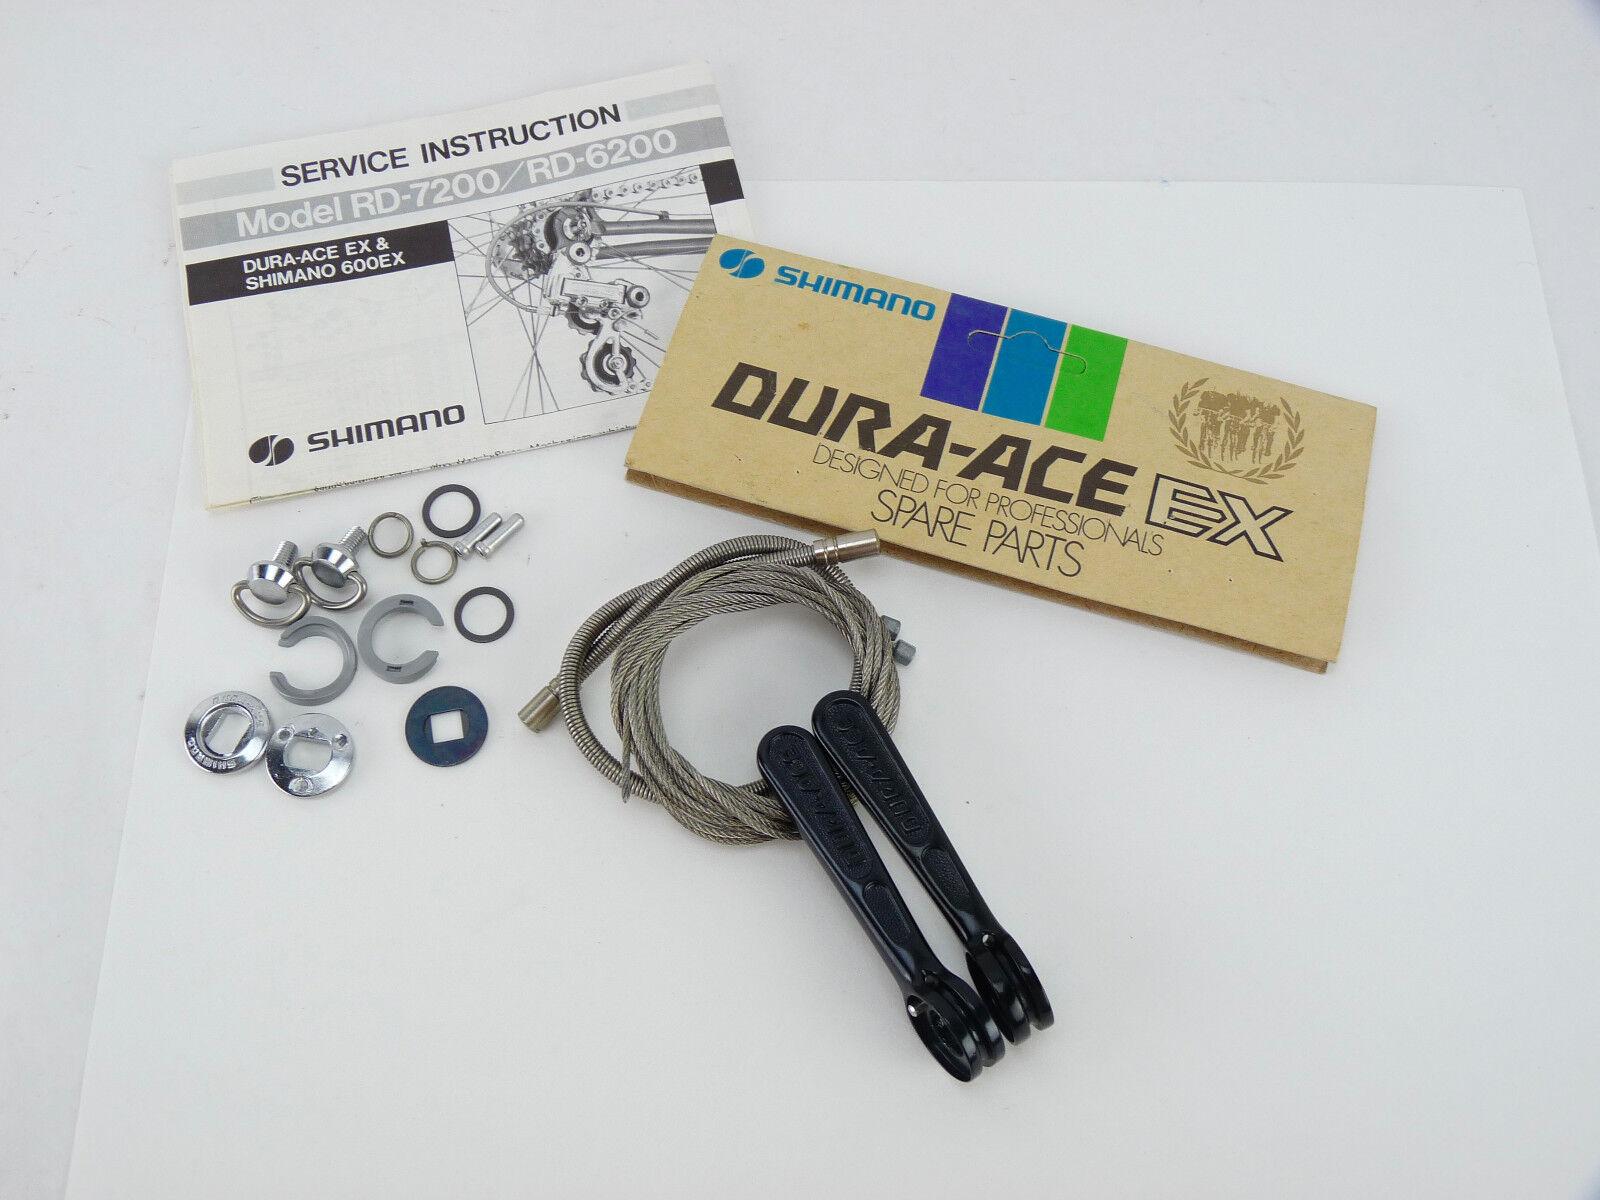 Dura ace shifters Shimano ex 7210 tubo diagonal Vintage Bike 4.5mm A-Tipo nos